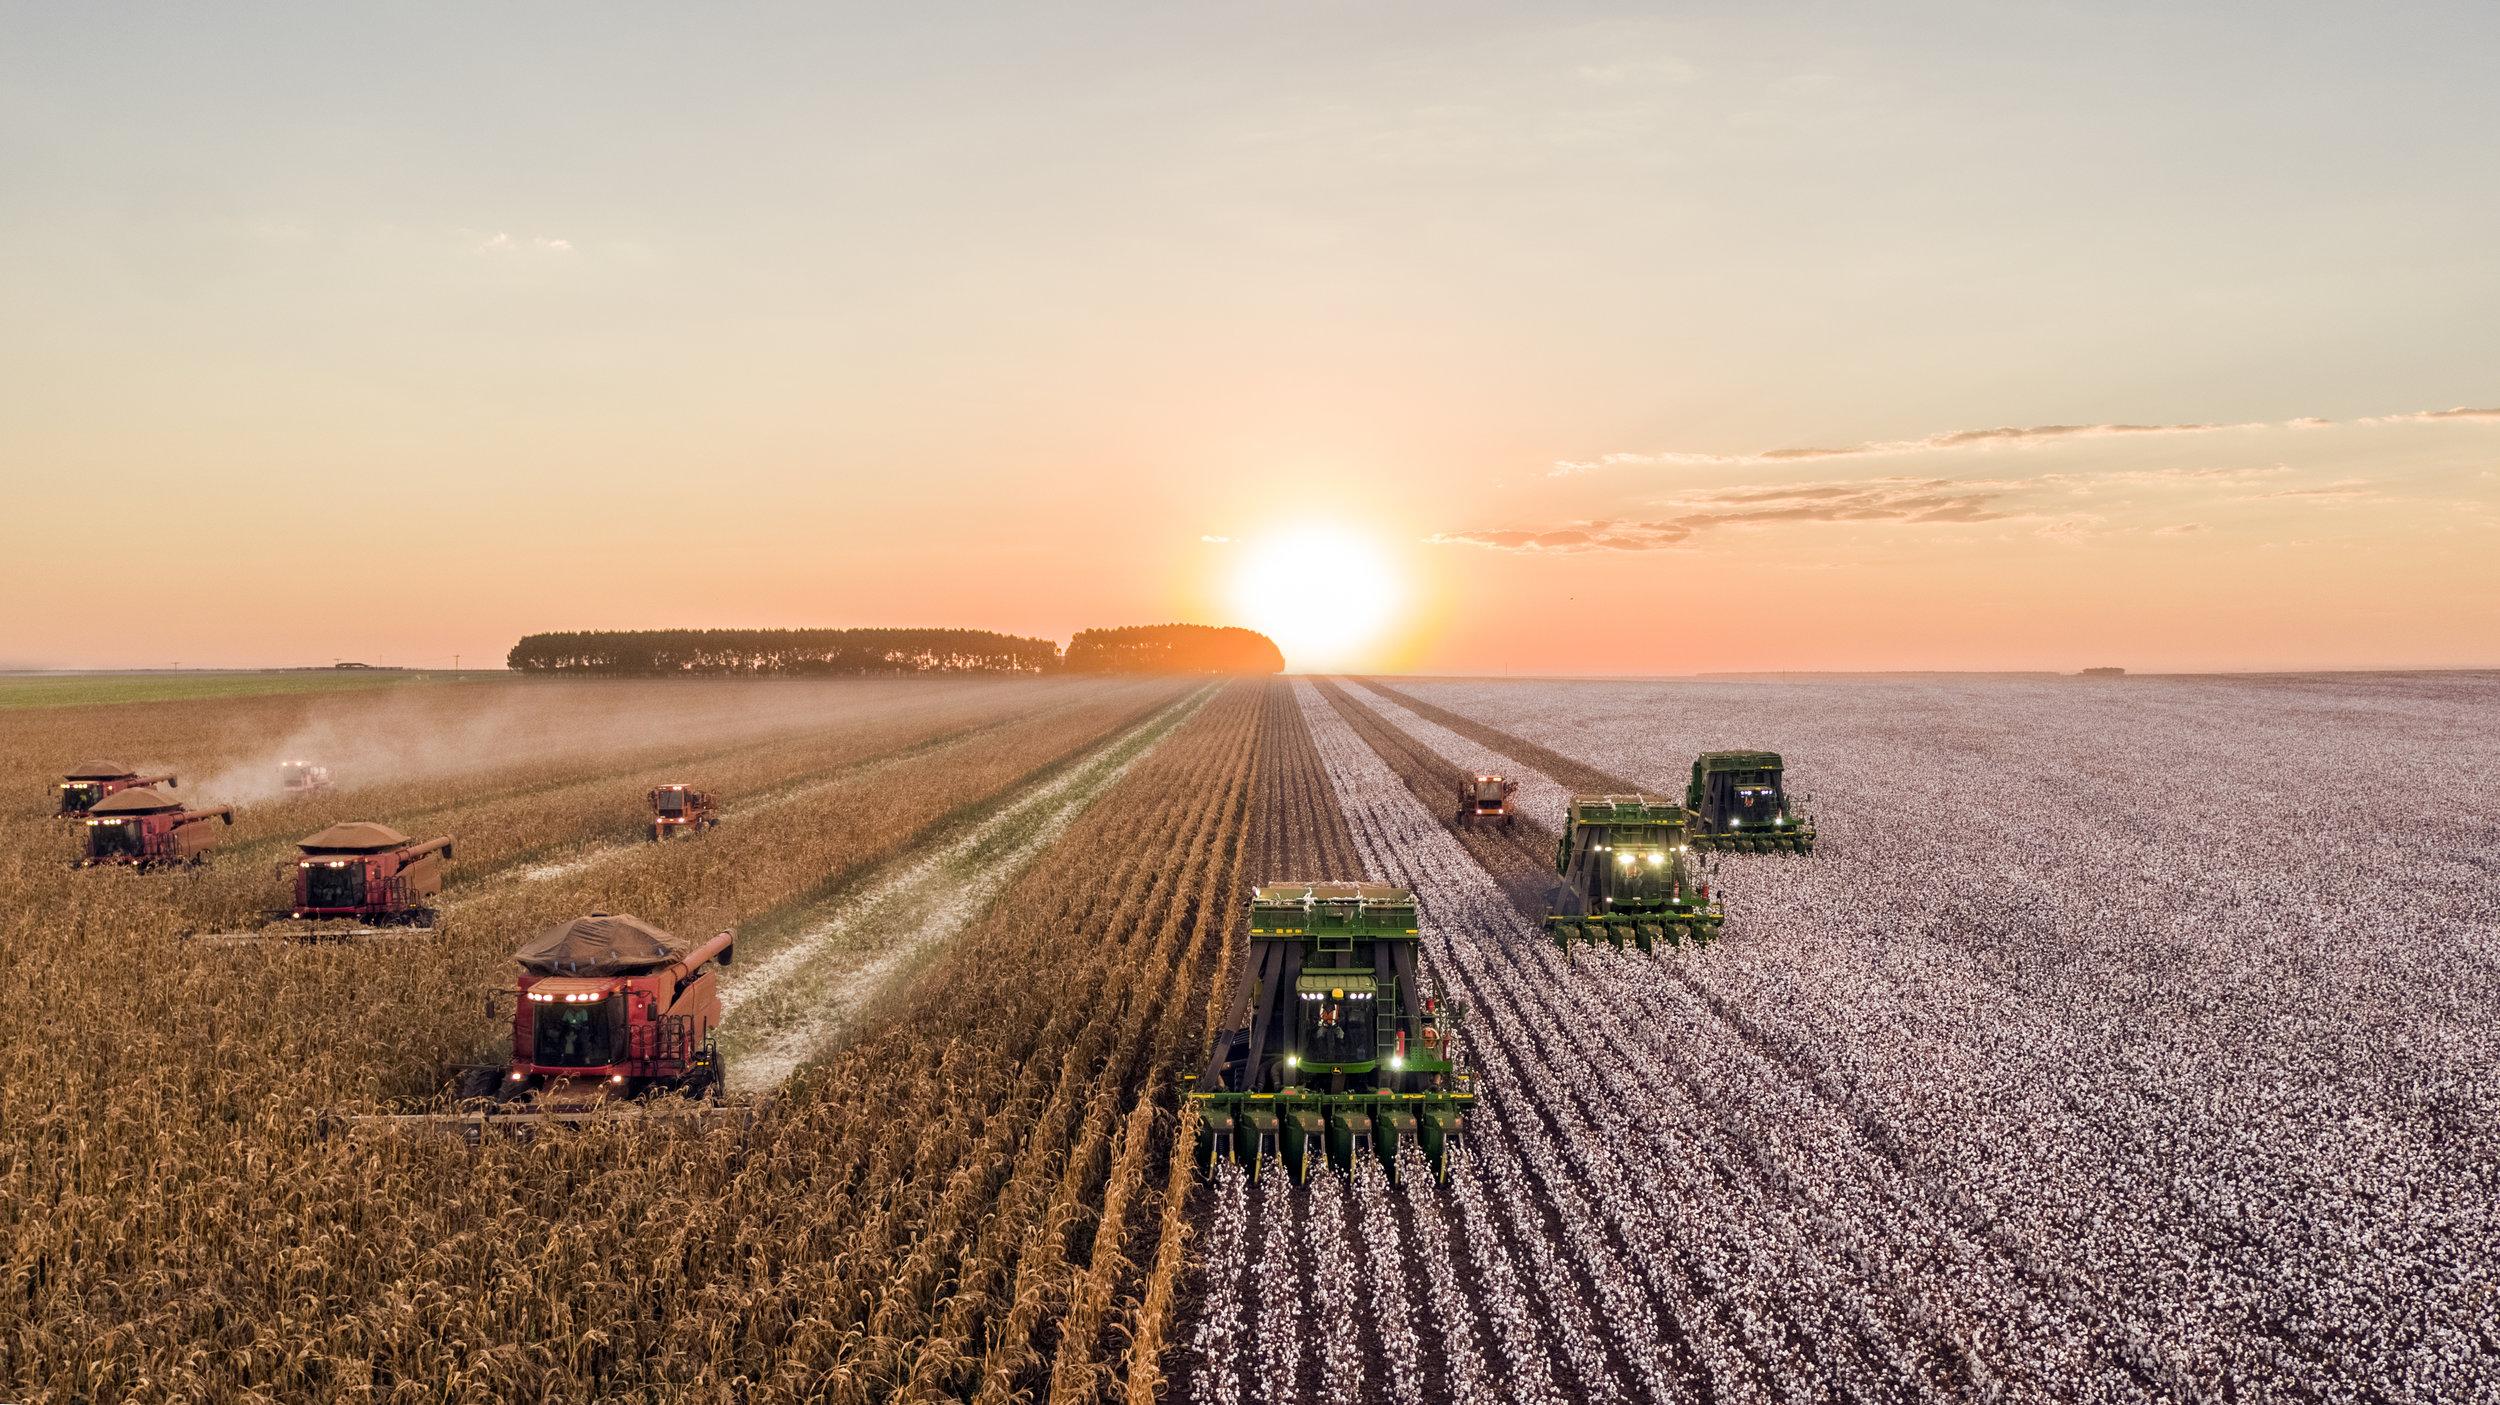 A fleet of tractors plowing a field. Credit: Joao Marcelo Marques/Unsplash